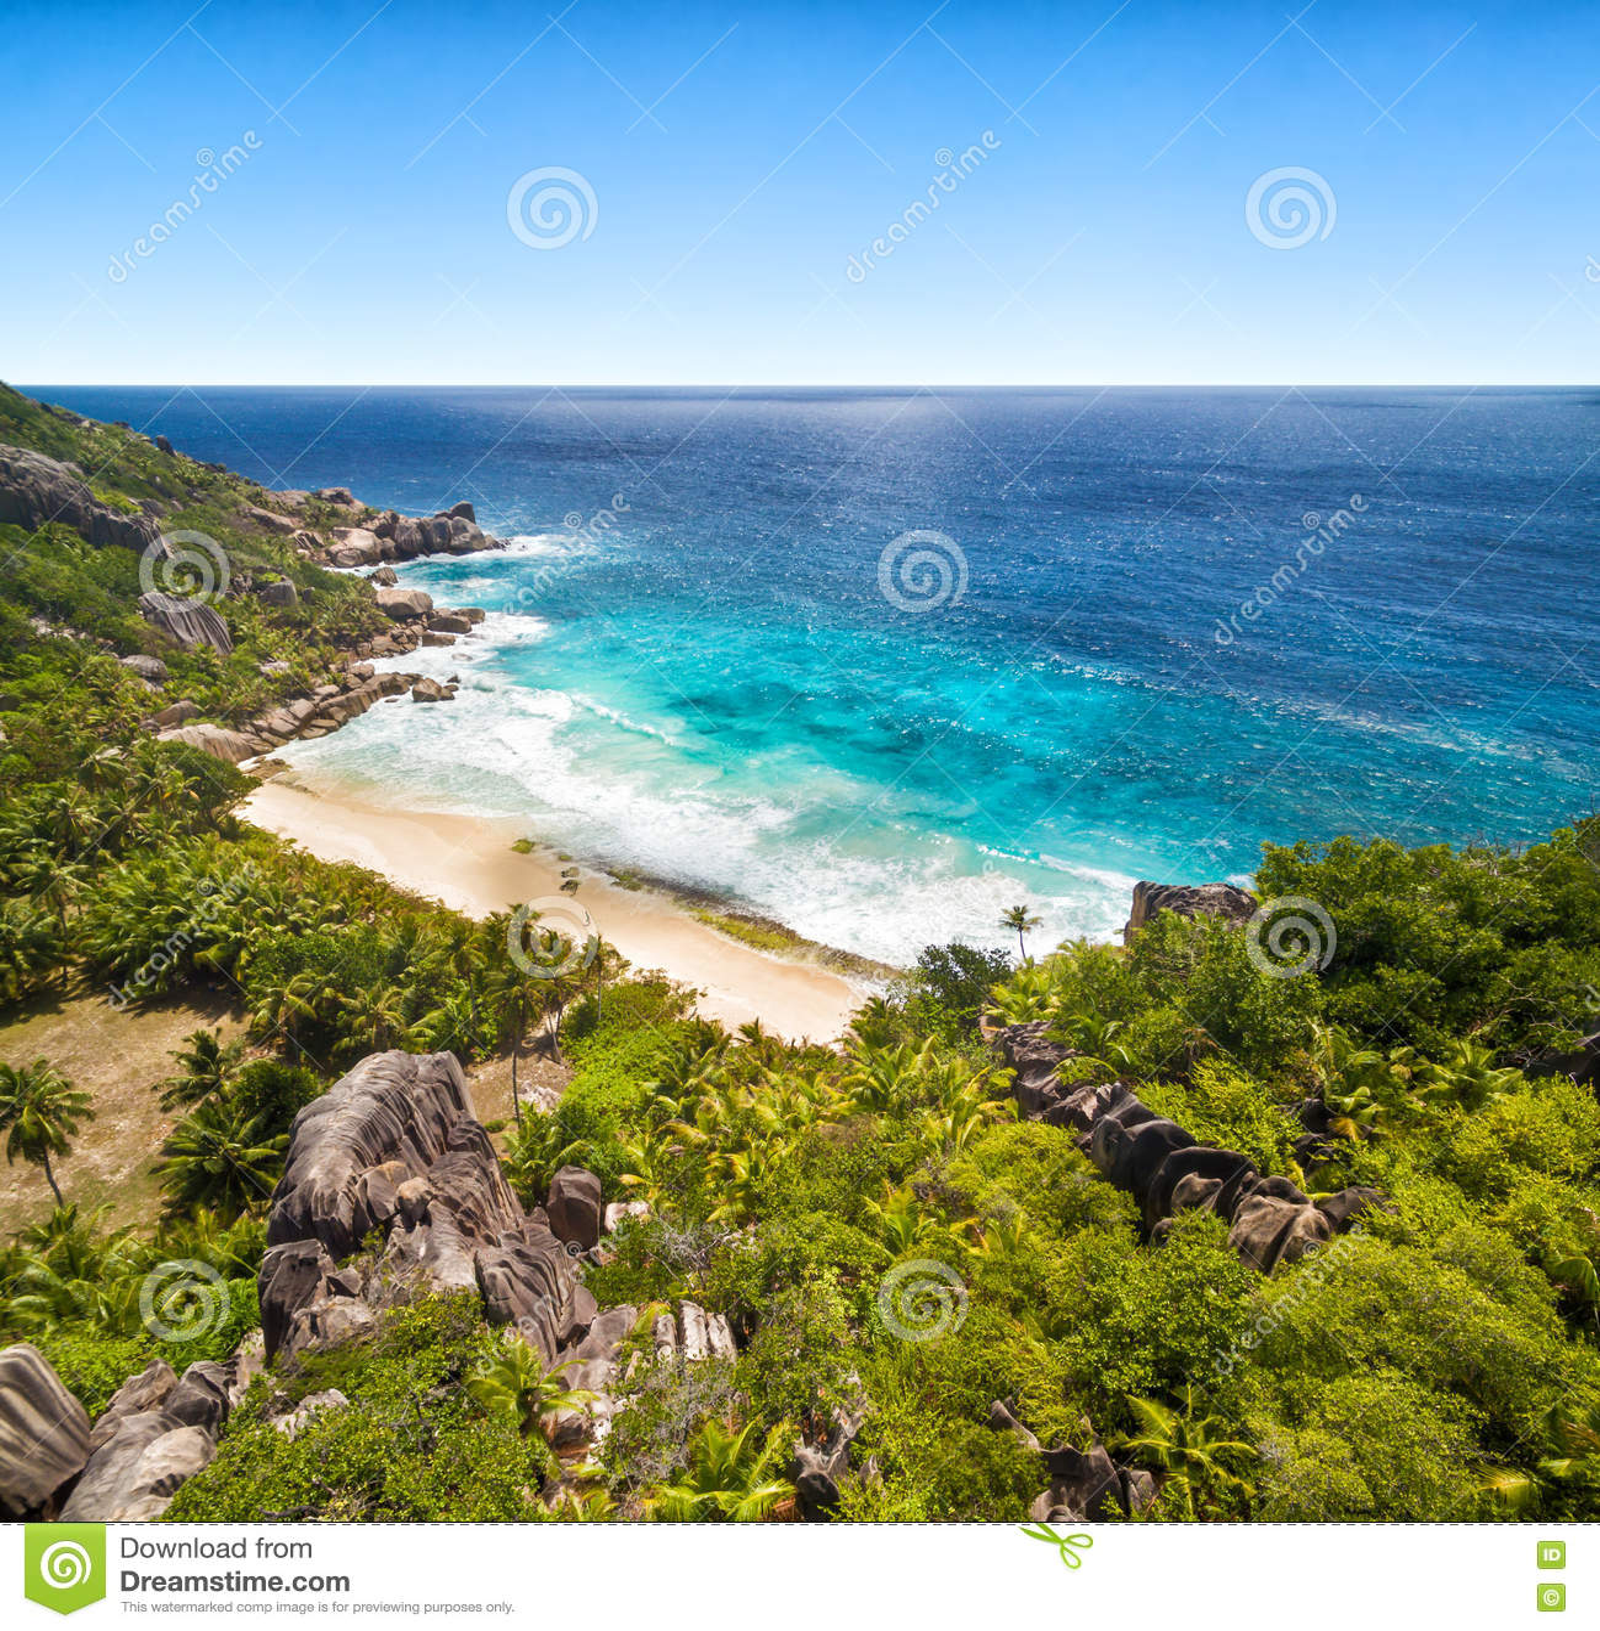 Seychelles Island Beaches: Beautiful Seychelles Island With Sandy Beach Stock Photo